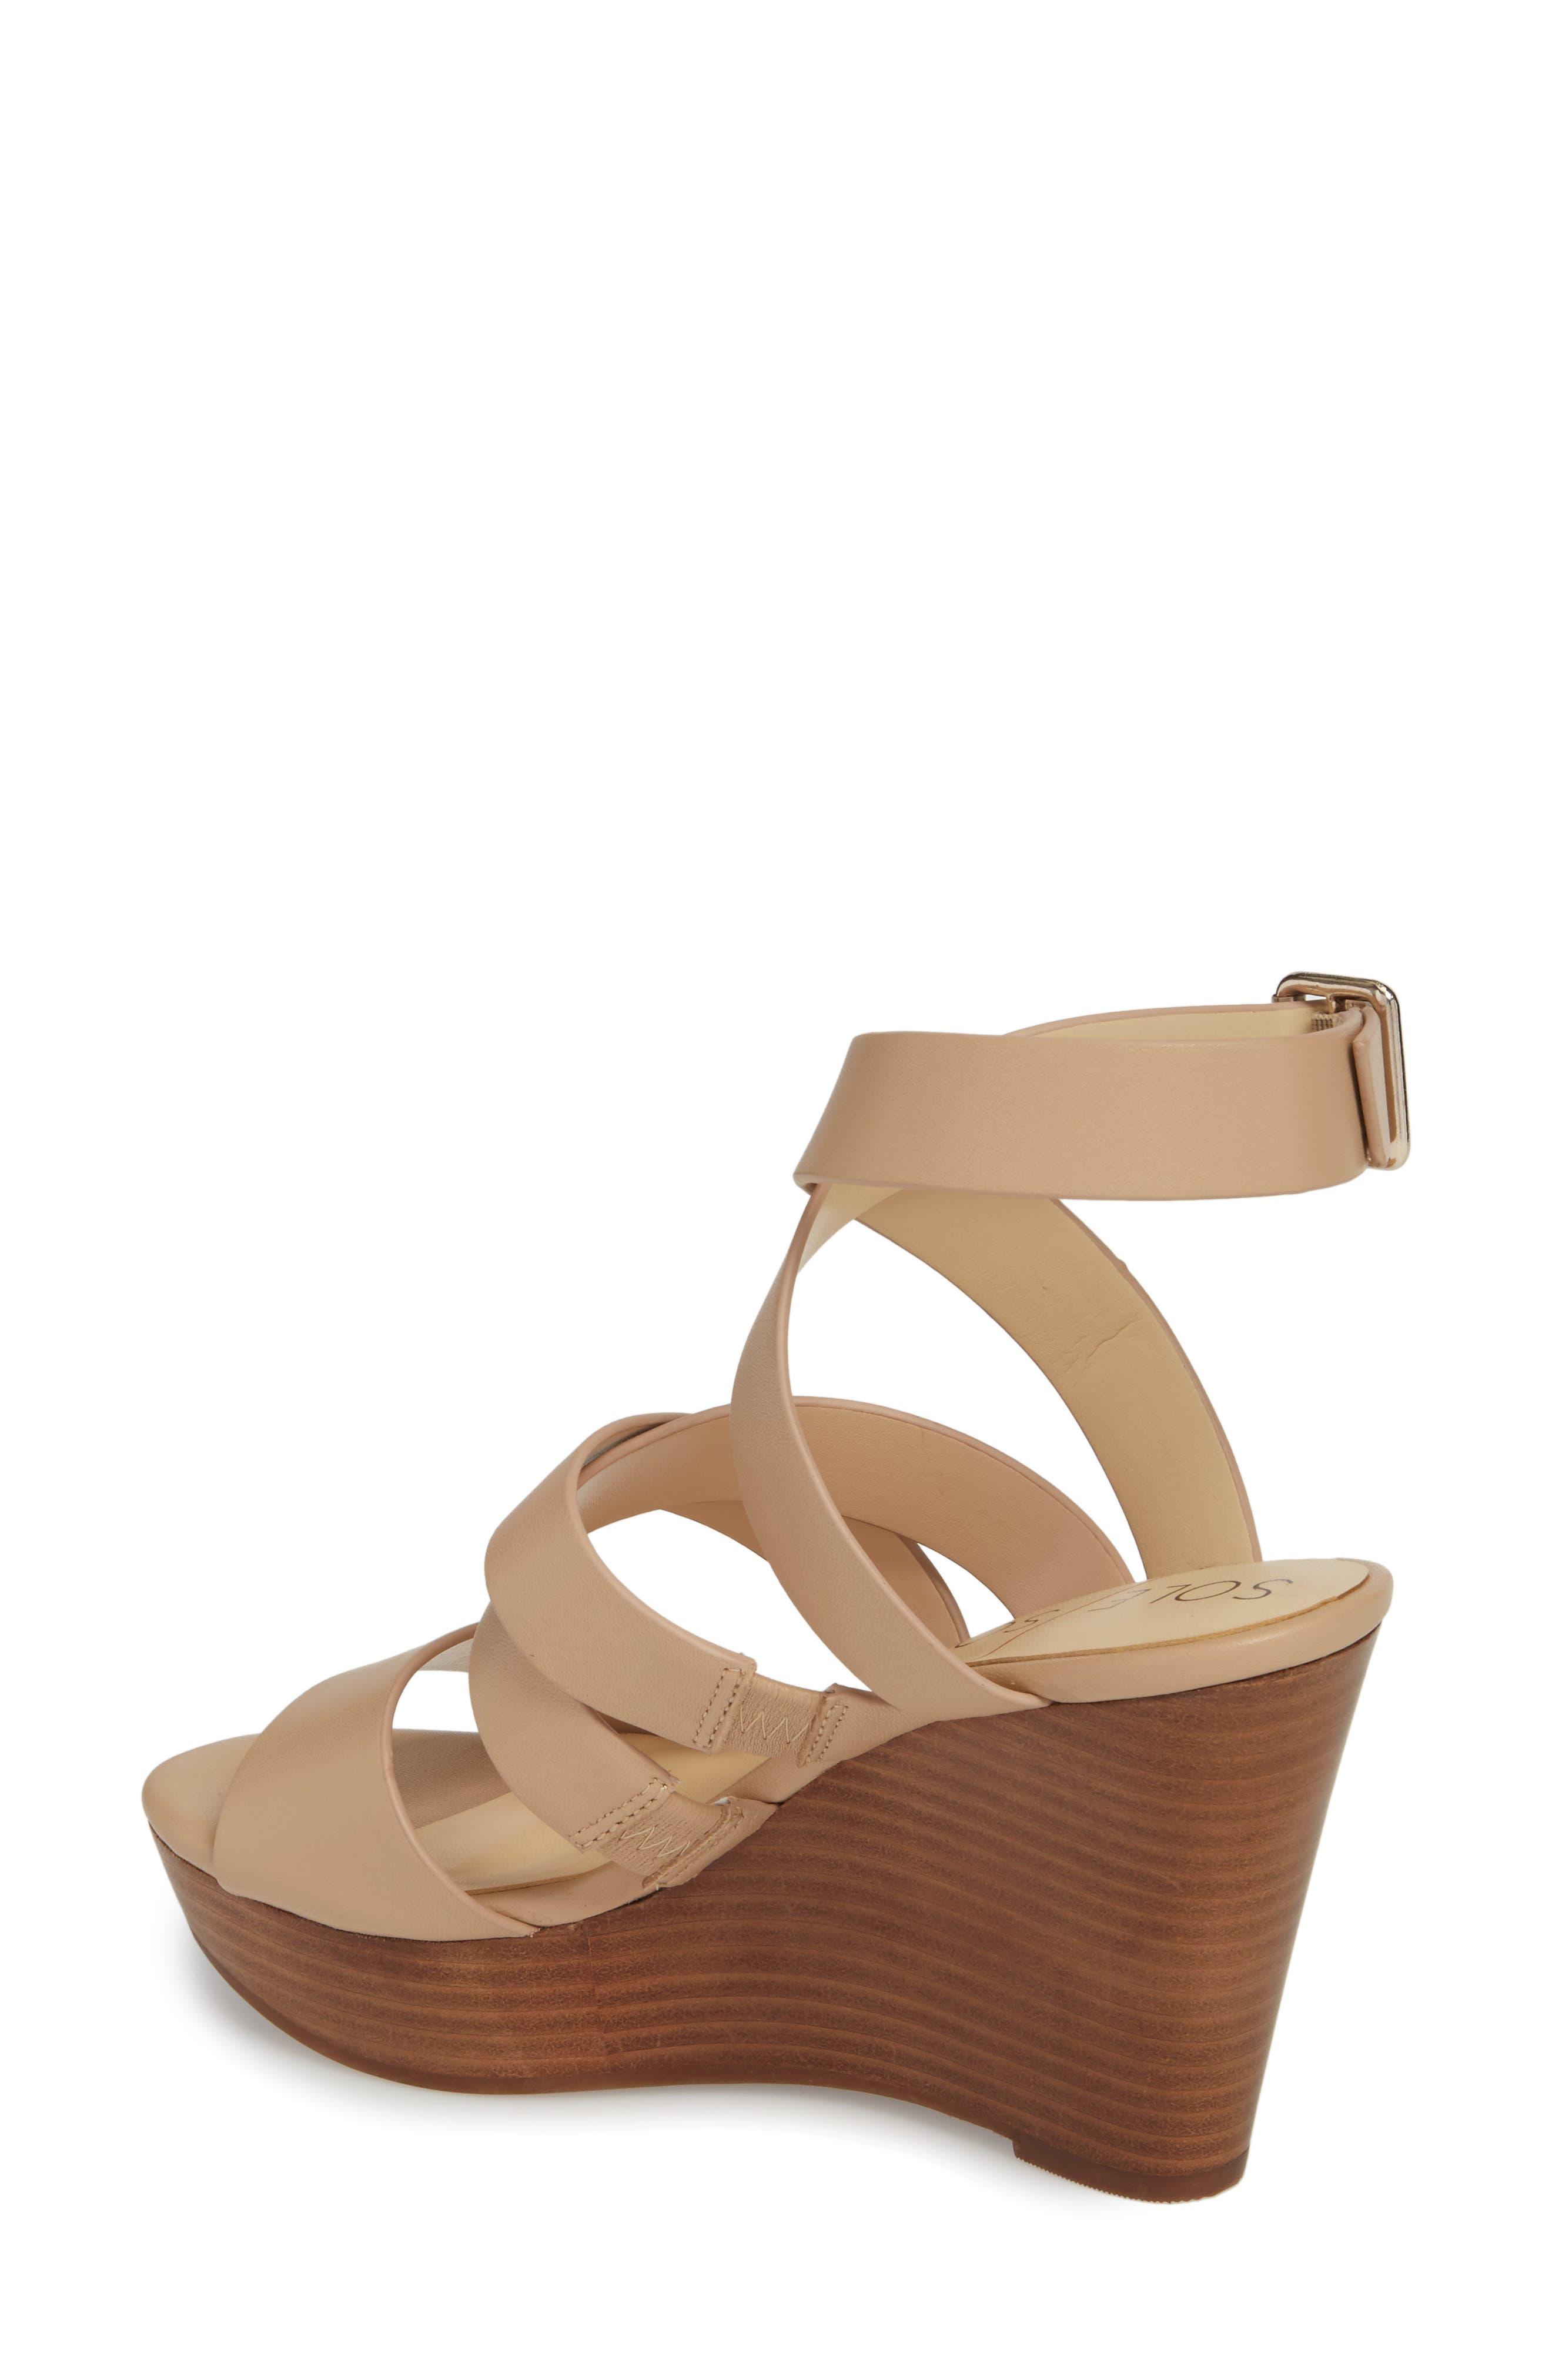 SOLE SOCIETY, Pippy Platform Sandal, Alternate thumbnail 2, color, TAN